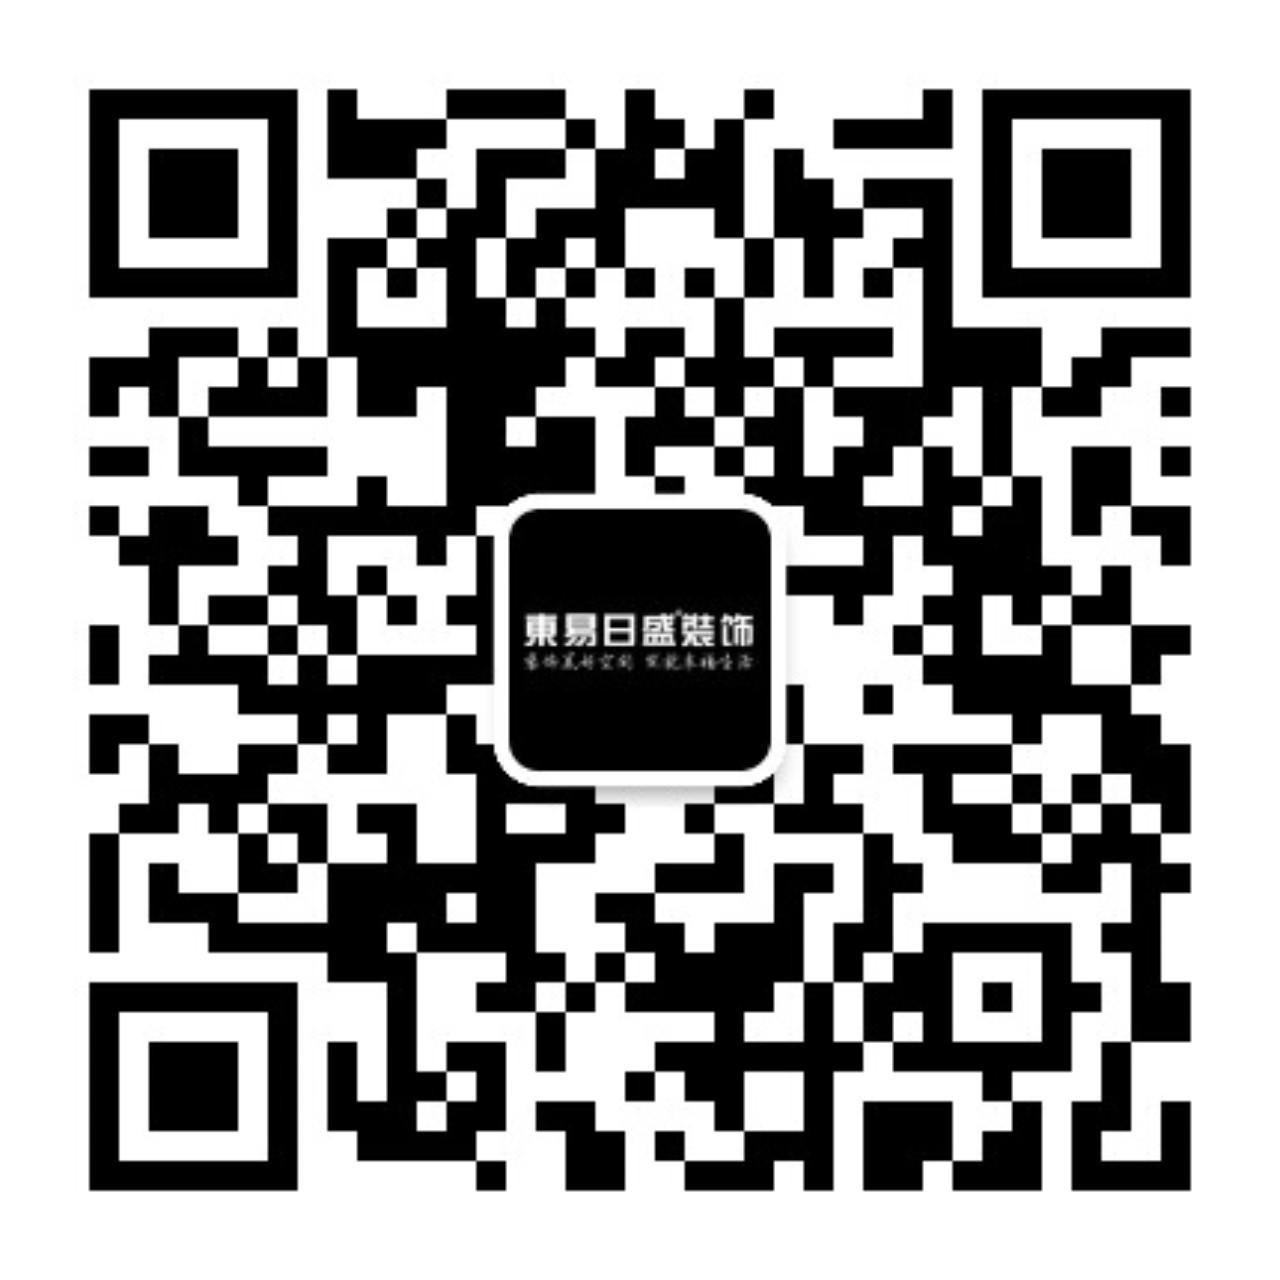 威尼斯888官方WeChat